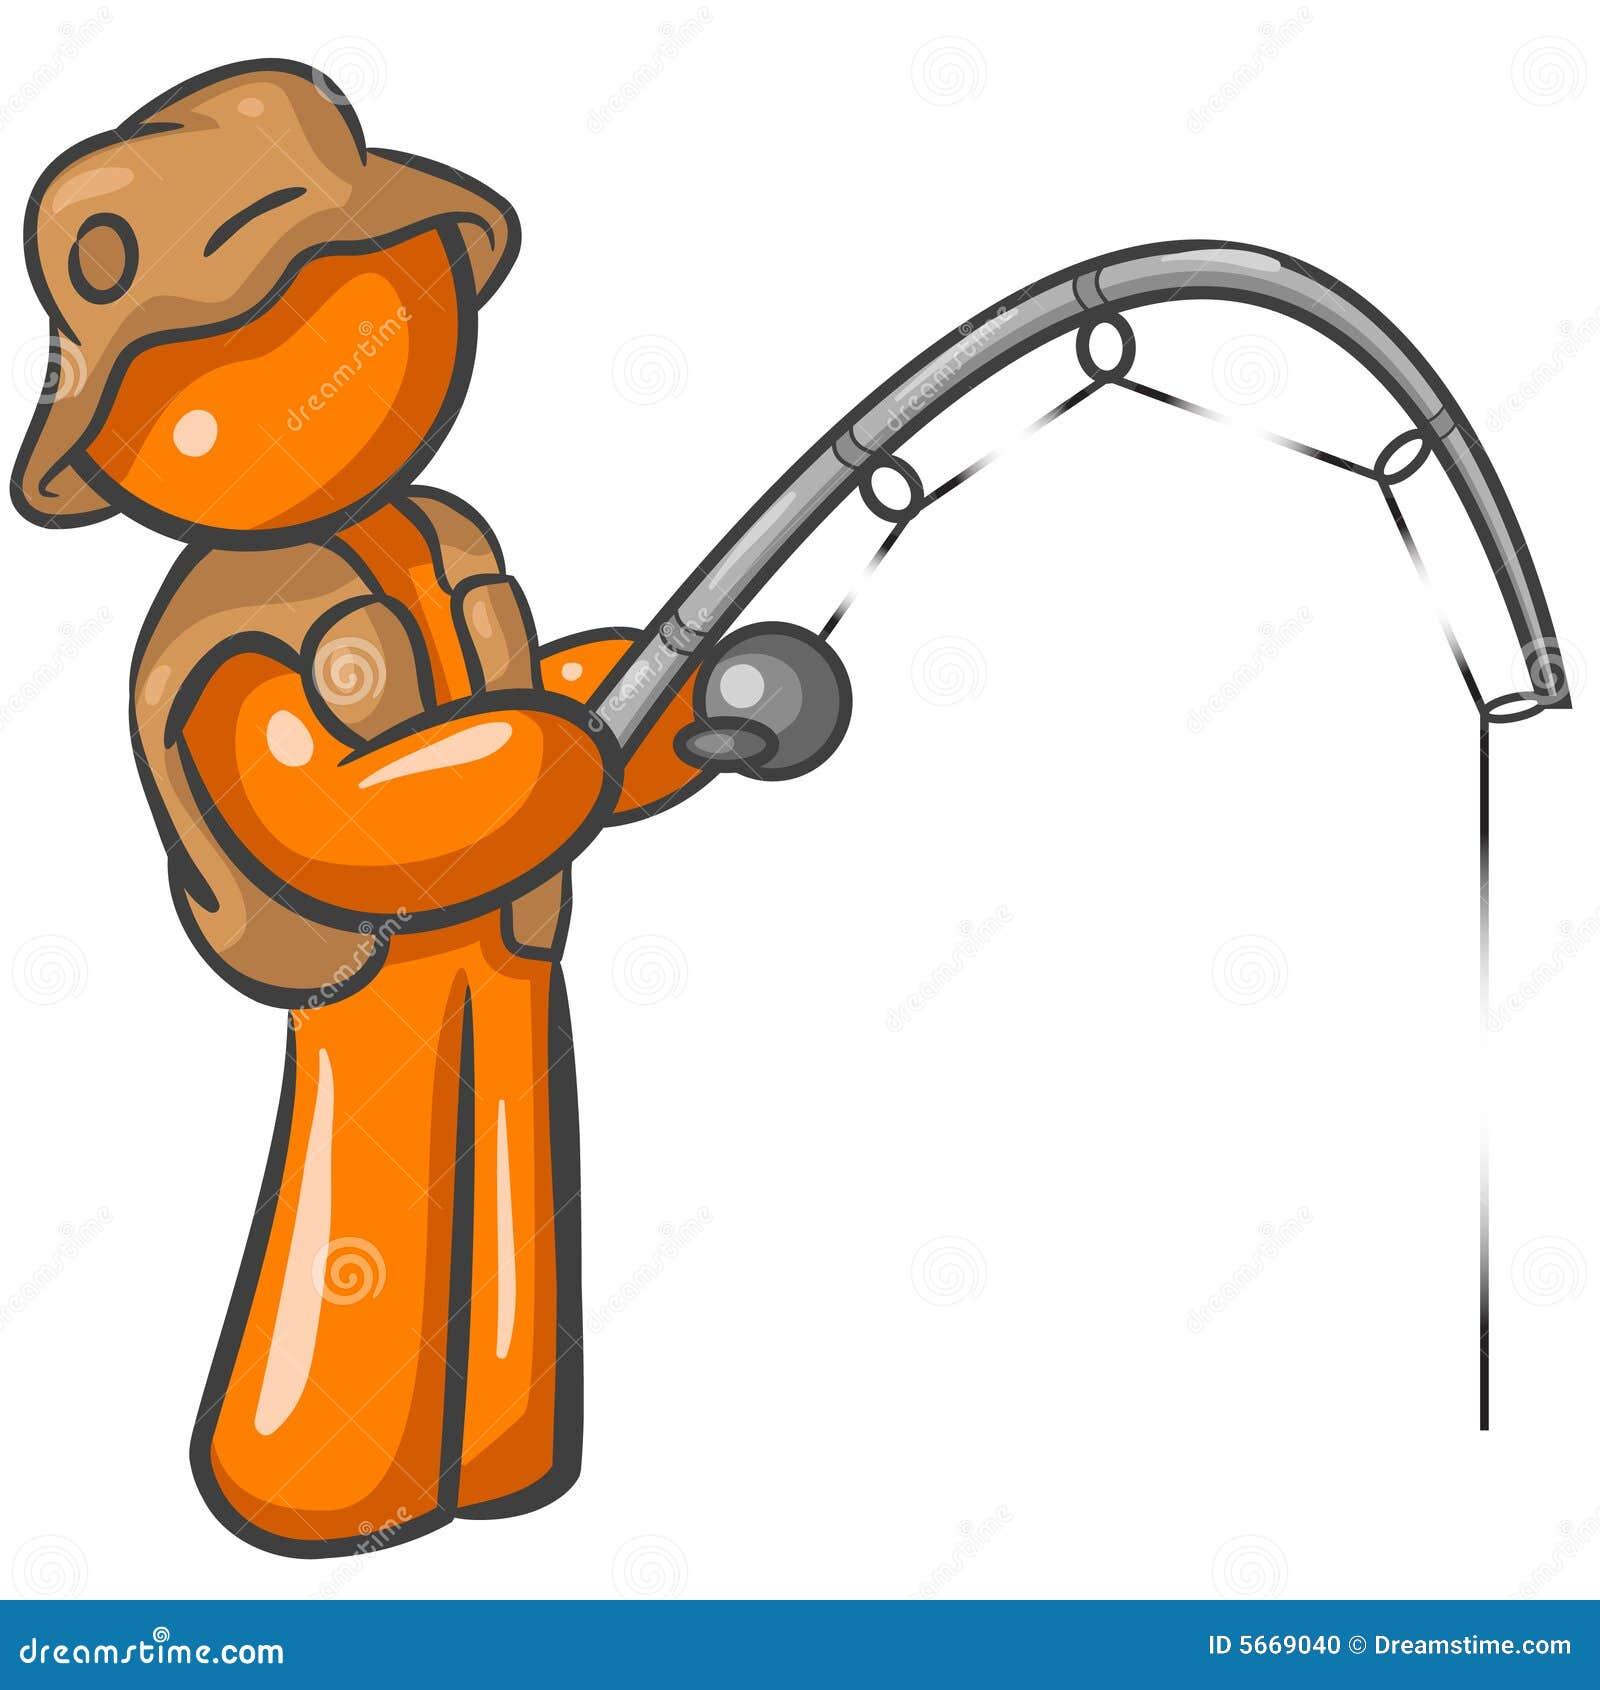 Cartoon of an orange man fishing with a fishing rod.